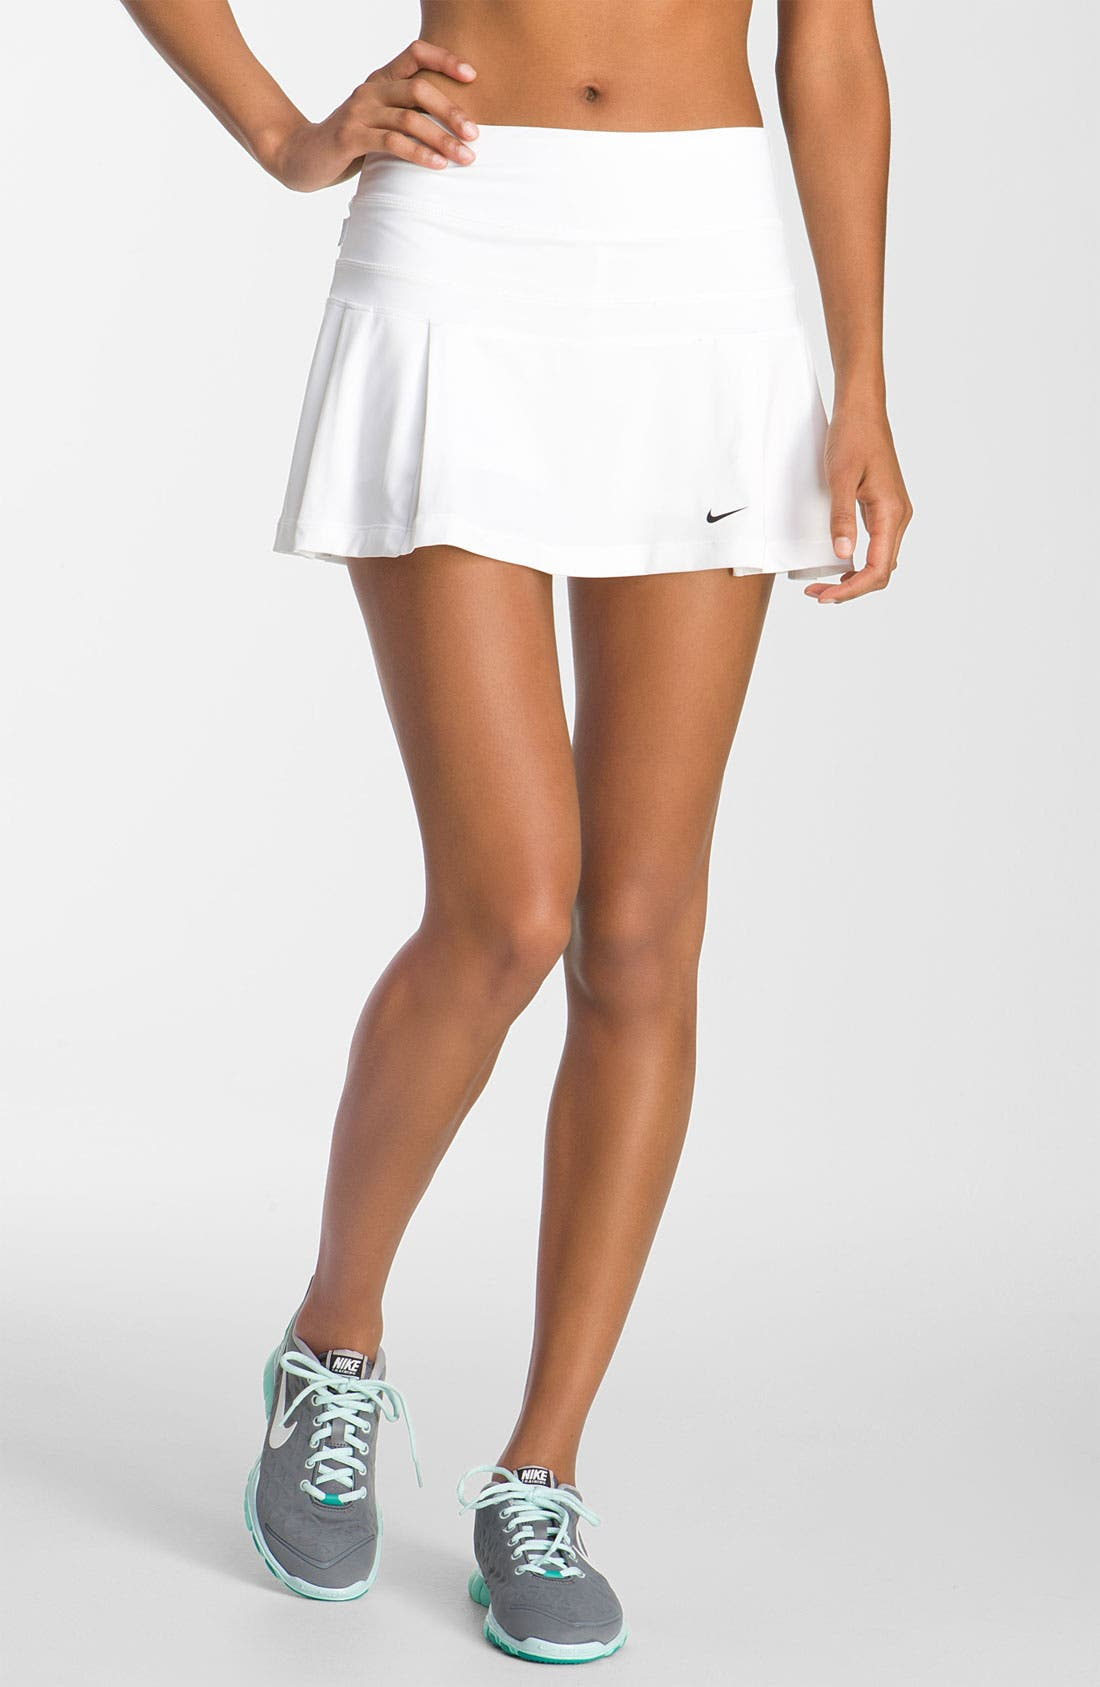 Main Image - Nike 'Share Athlete' Tennis Skirt